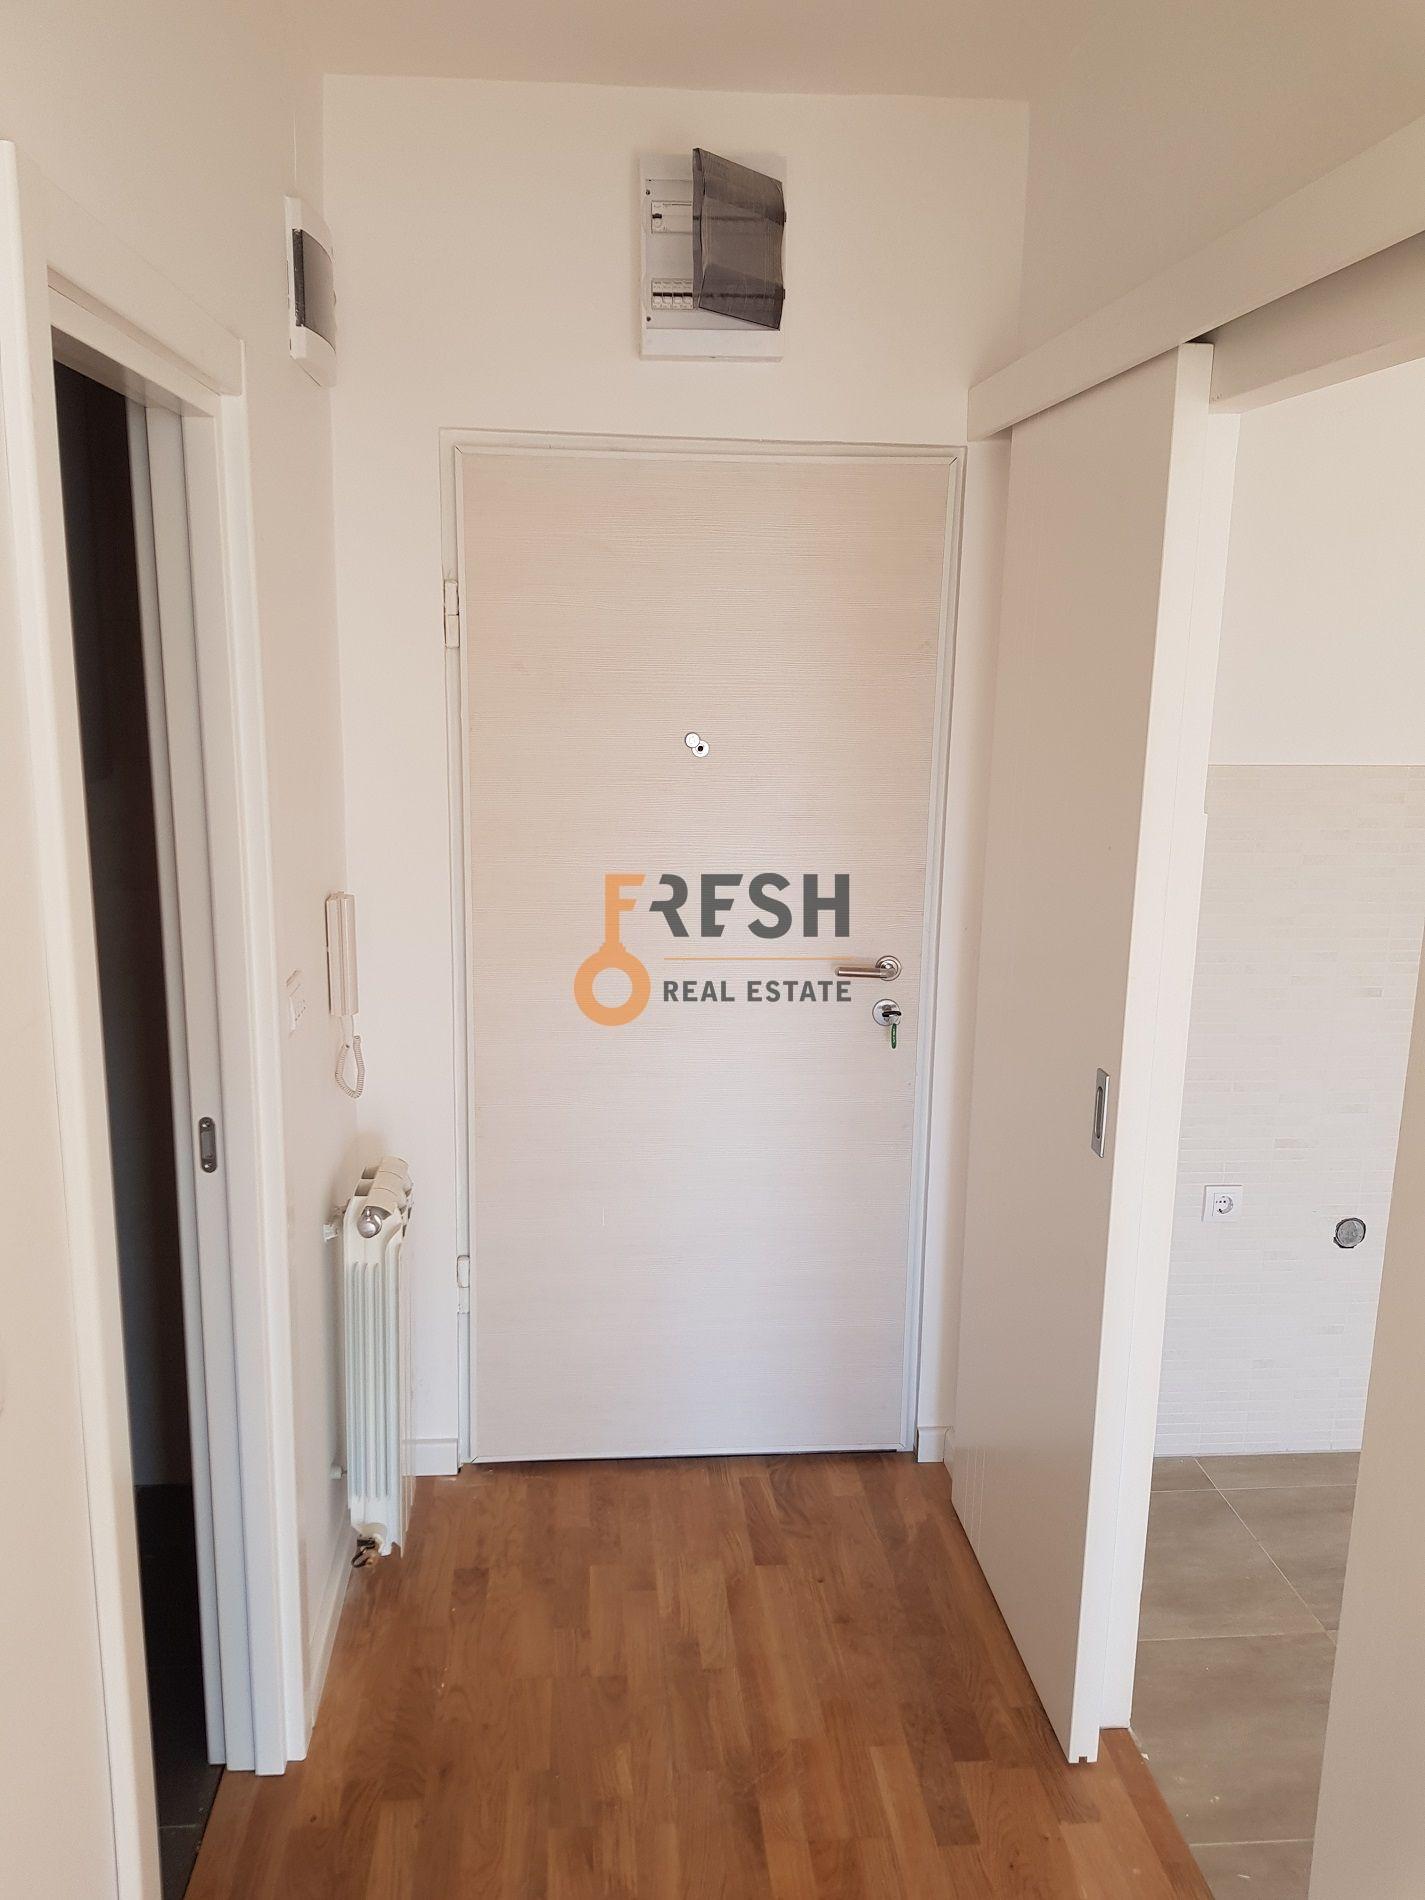 Jednosoban stan 45 m2, Centar, Pljevlja, Prodaja - 13